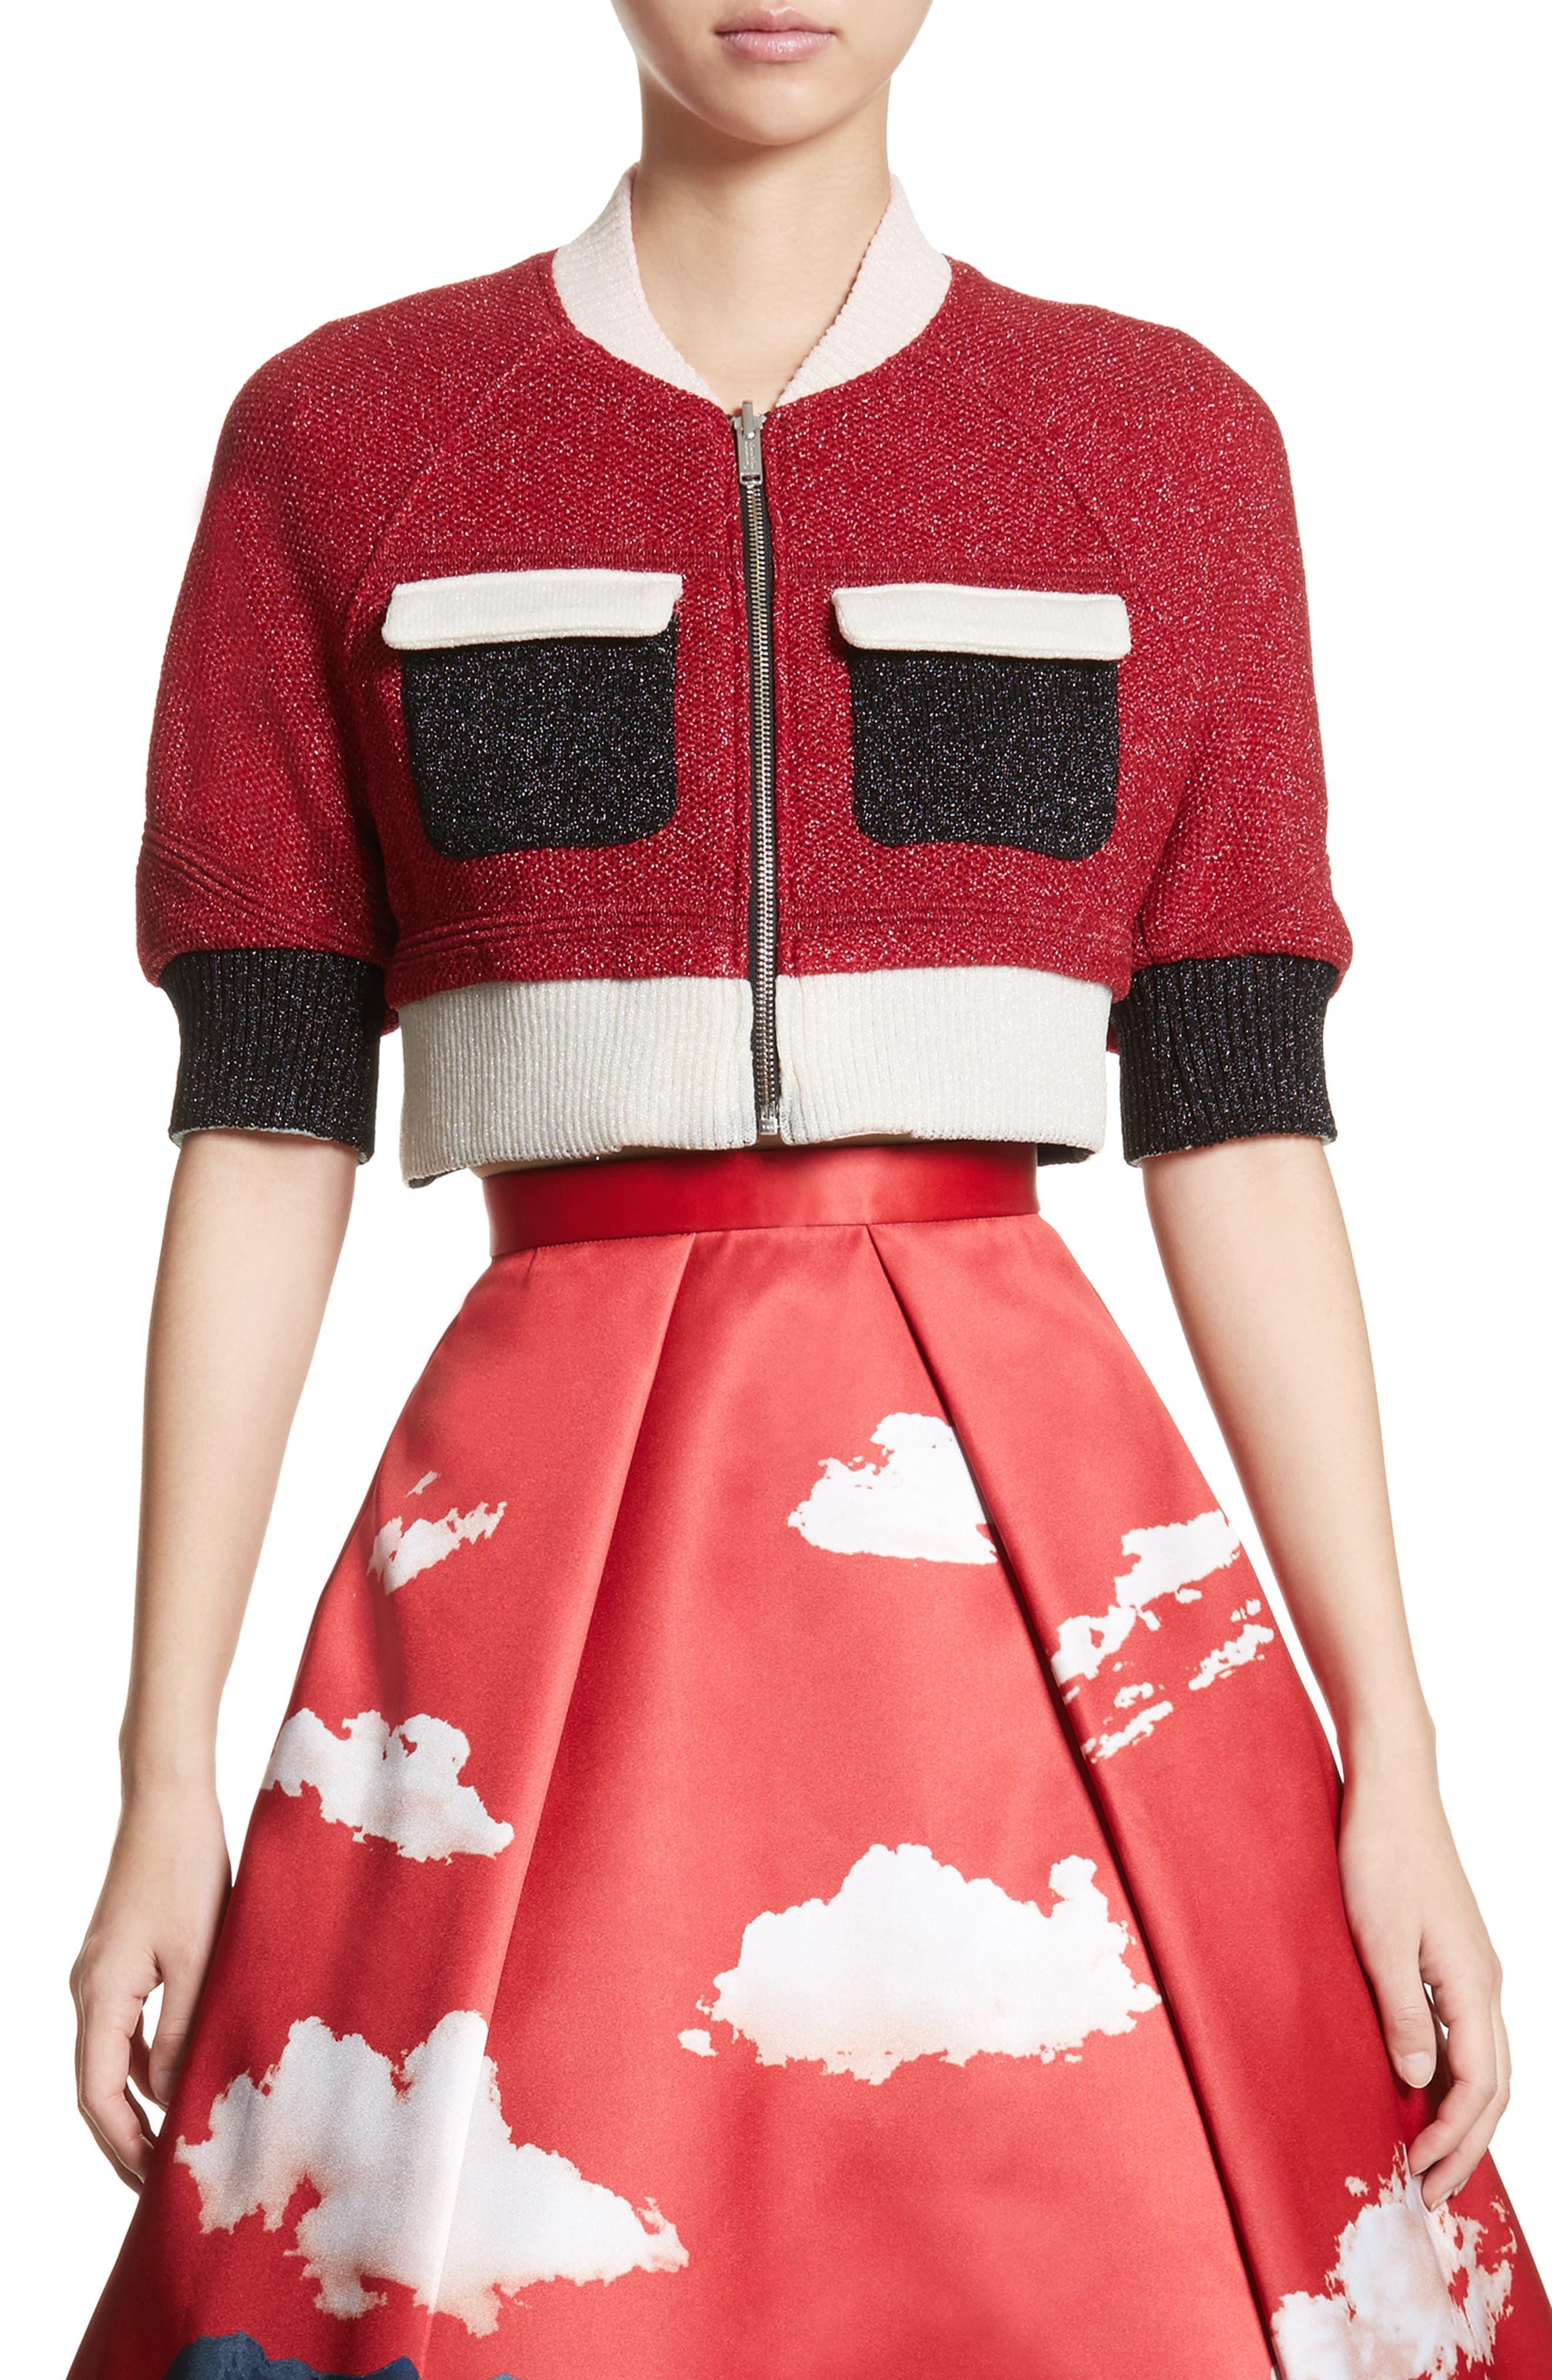 Reversible Crop Jacket,                             Main thumbnail 1, color,                             Brown/ Red